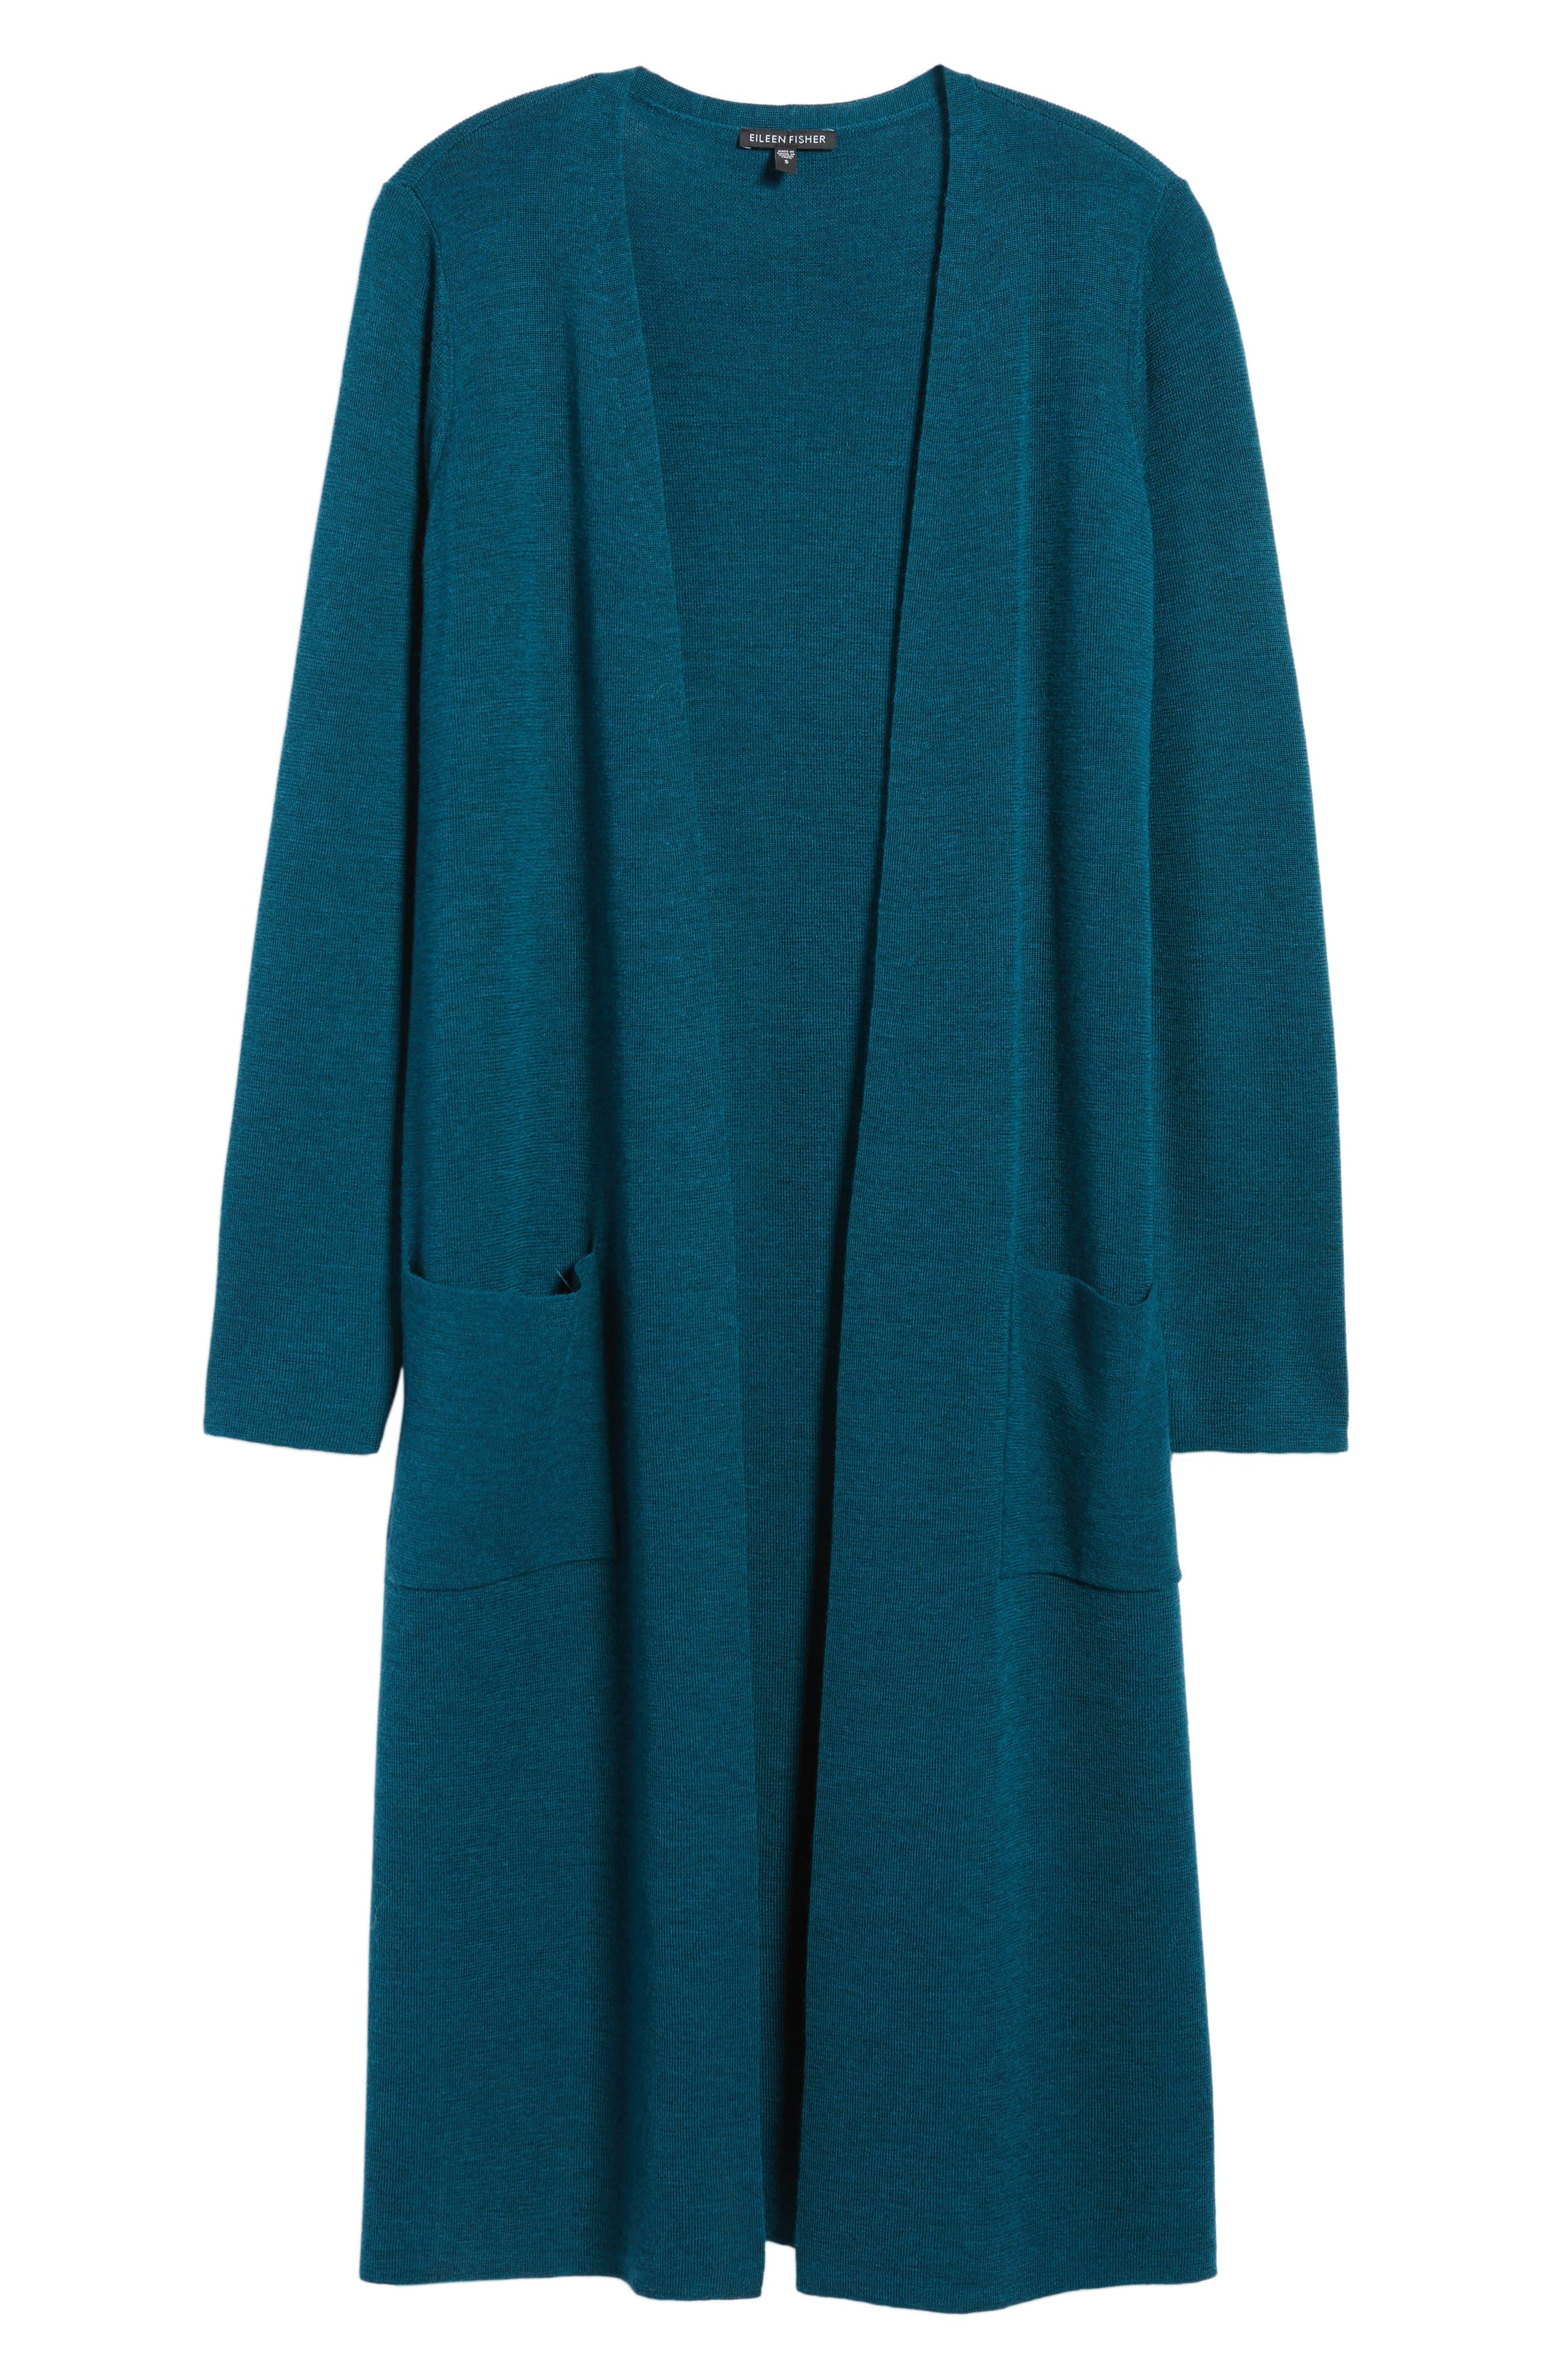 Long Merino Wool Cardigan,                             Alternate thumbnail 6, color,                             Blue Spruce